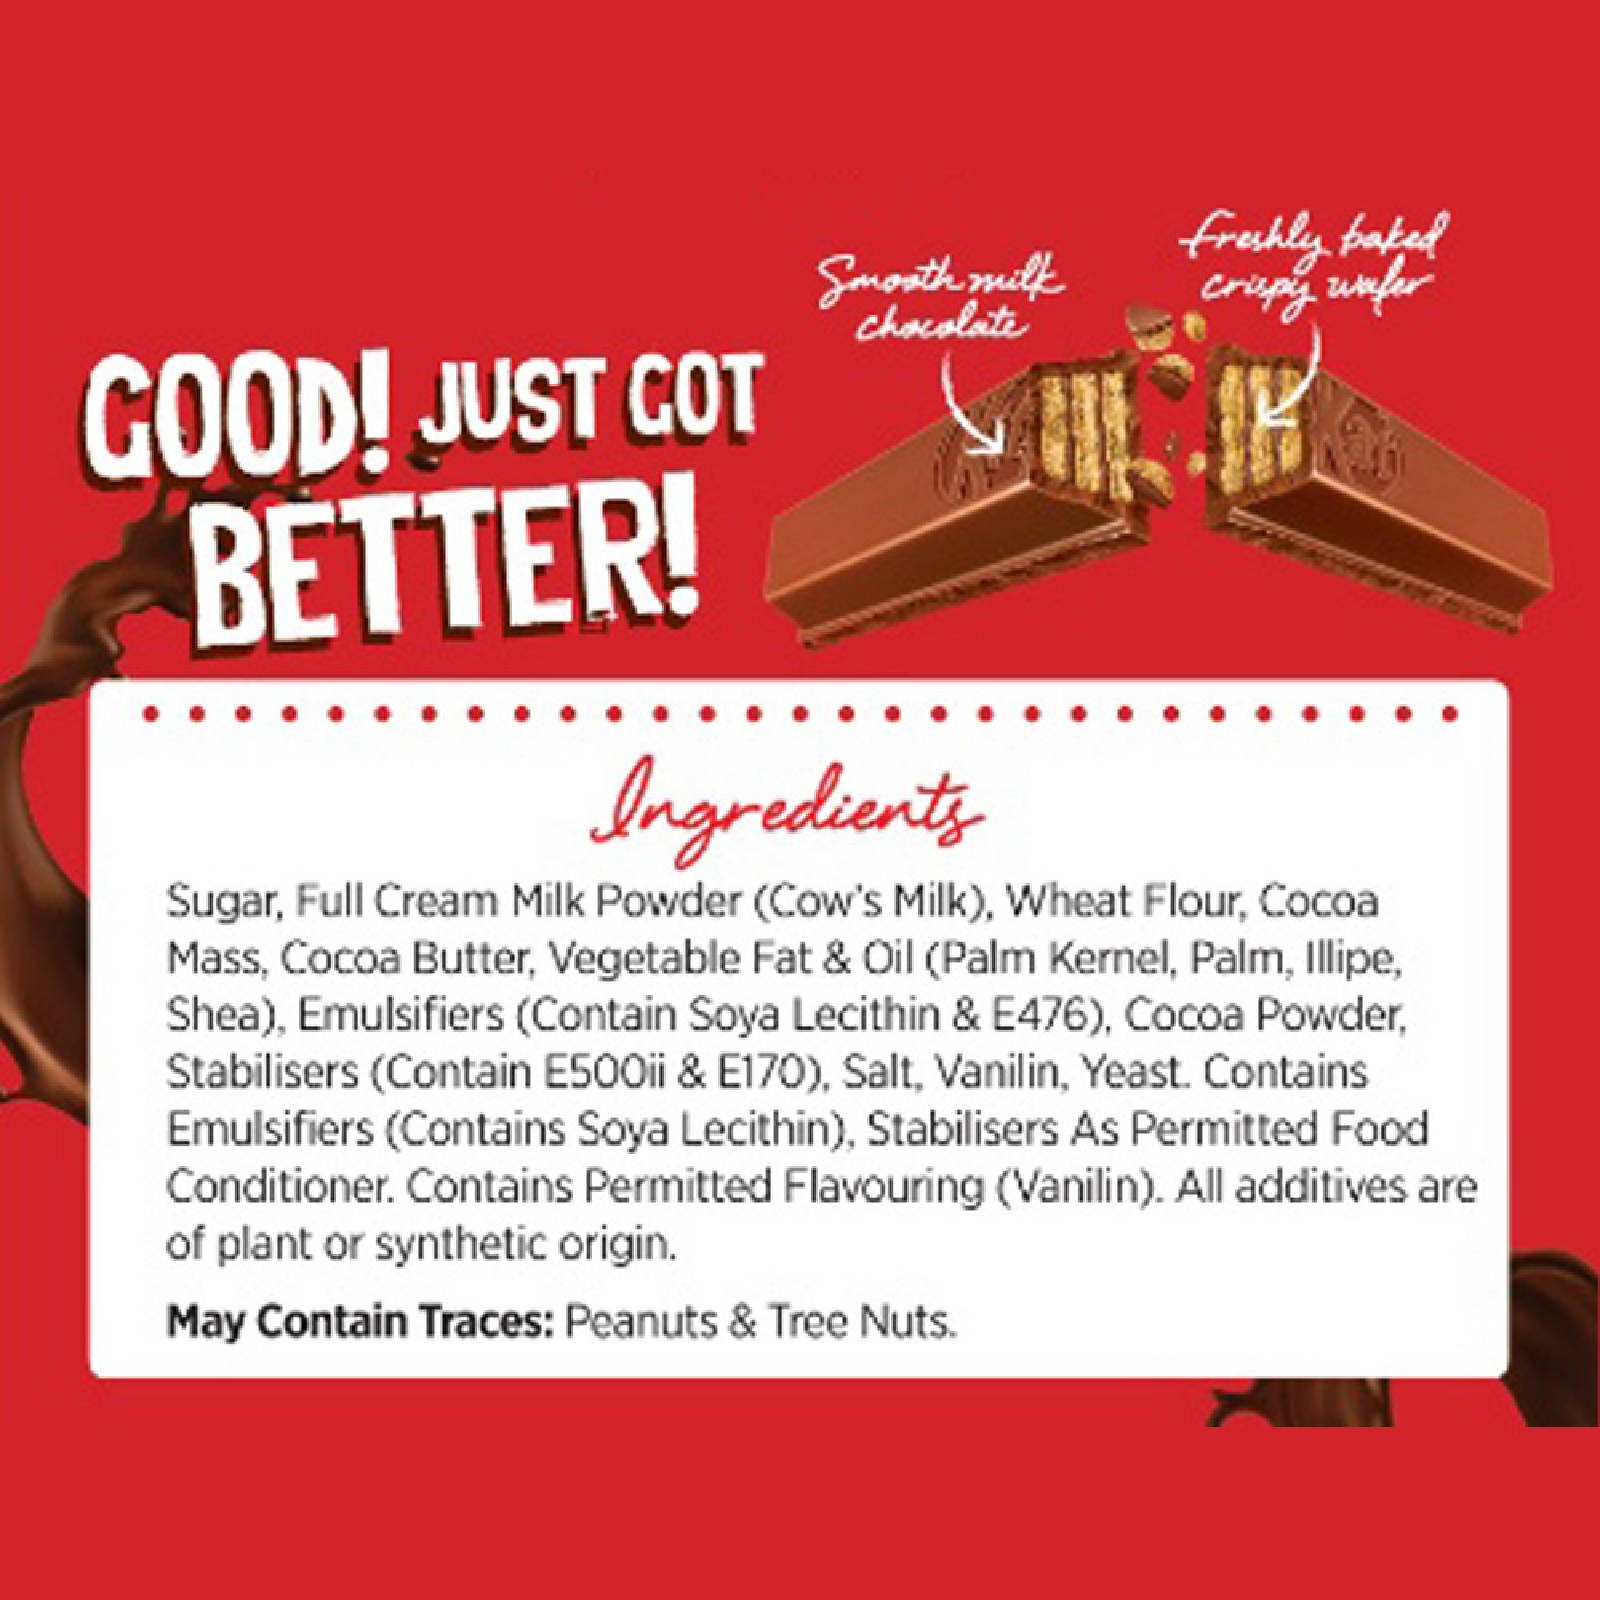 Kit Kat Chocolate Value Pack (24s x 17g)